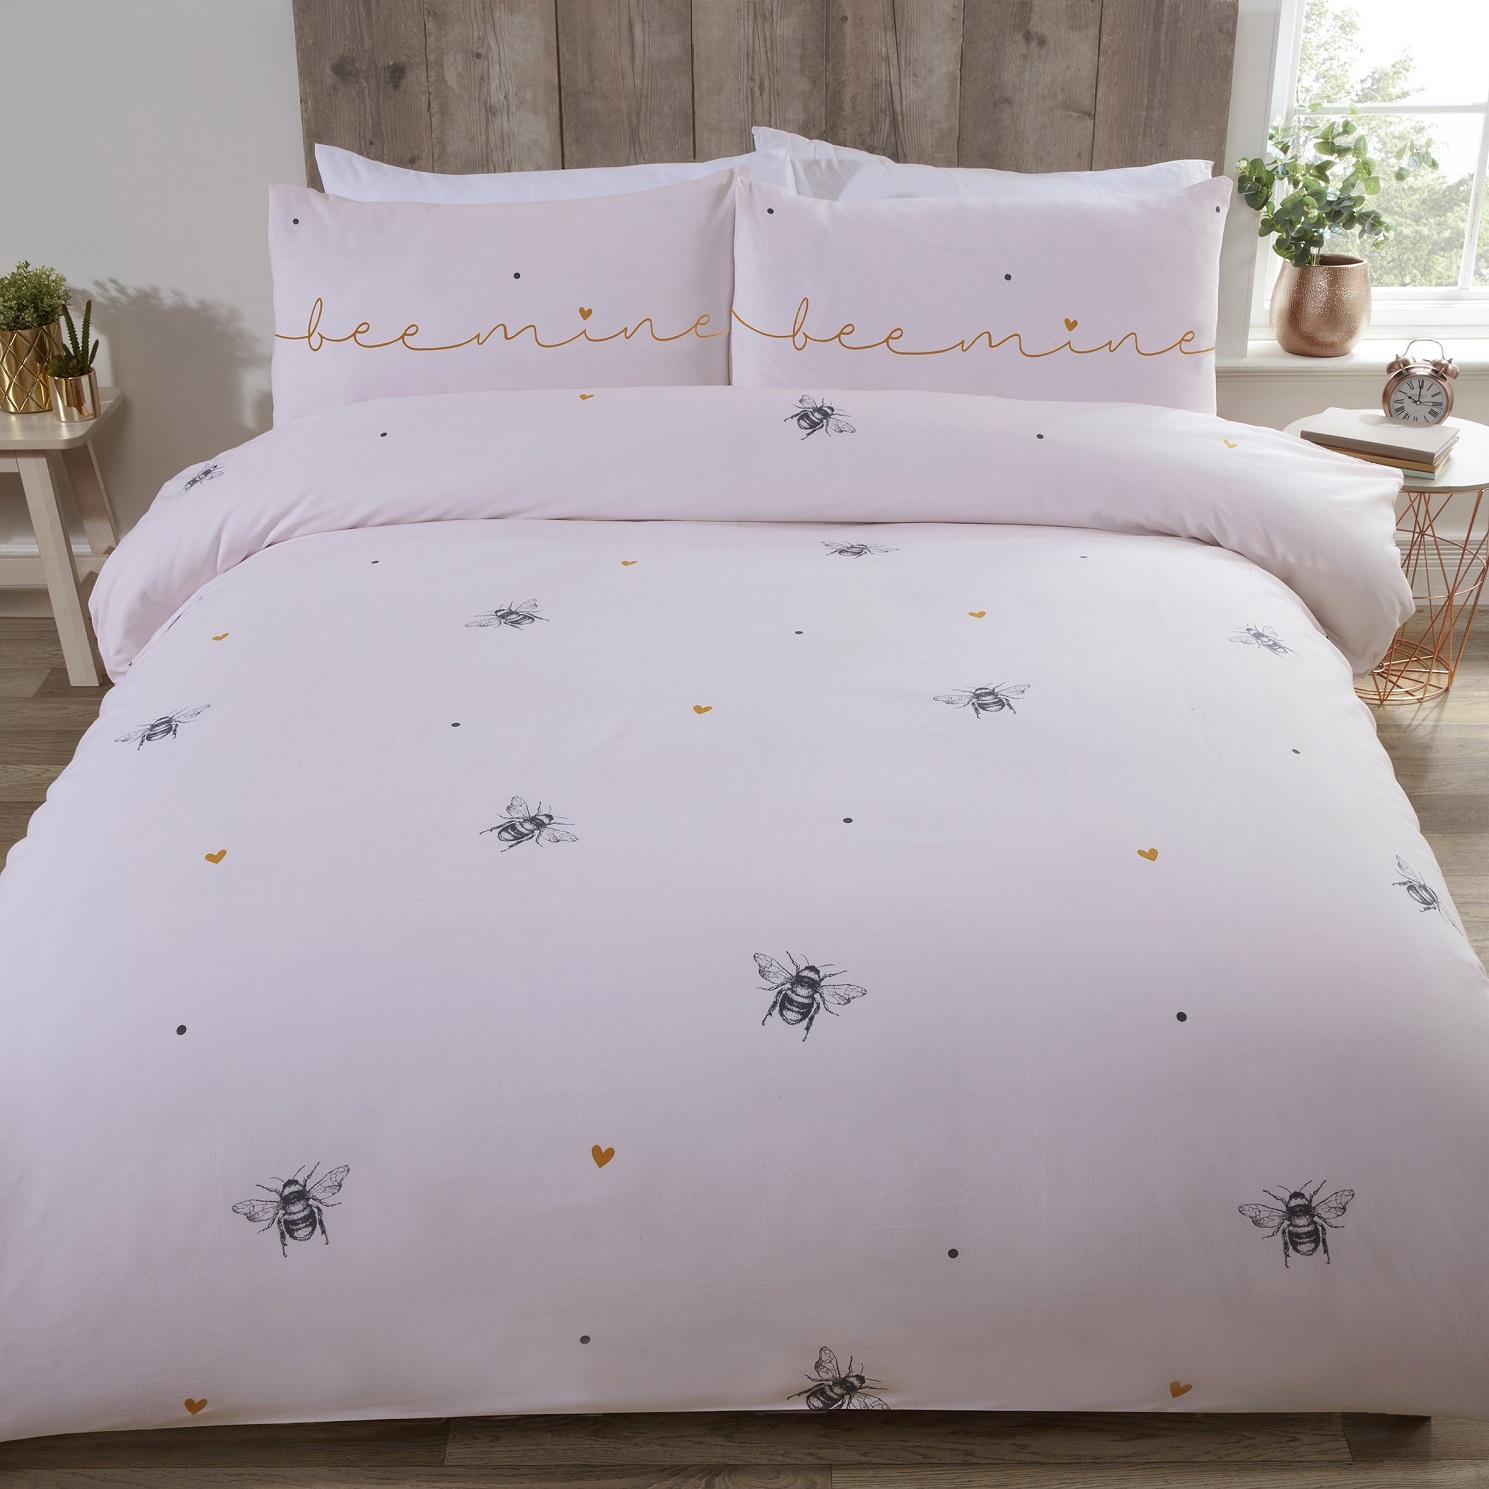 Bee Mine King Duvet Cover Heart Bumble Bee Quilt Bedding Set Ochre Yellow Pink Ebay